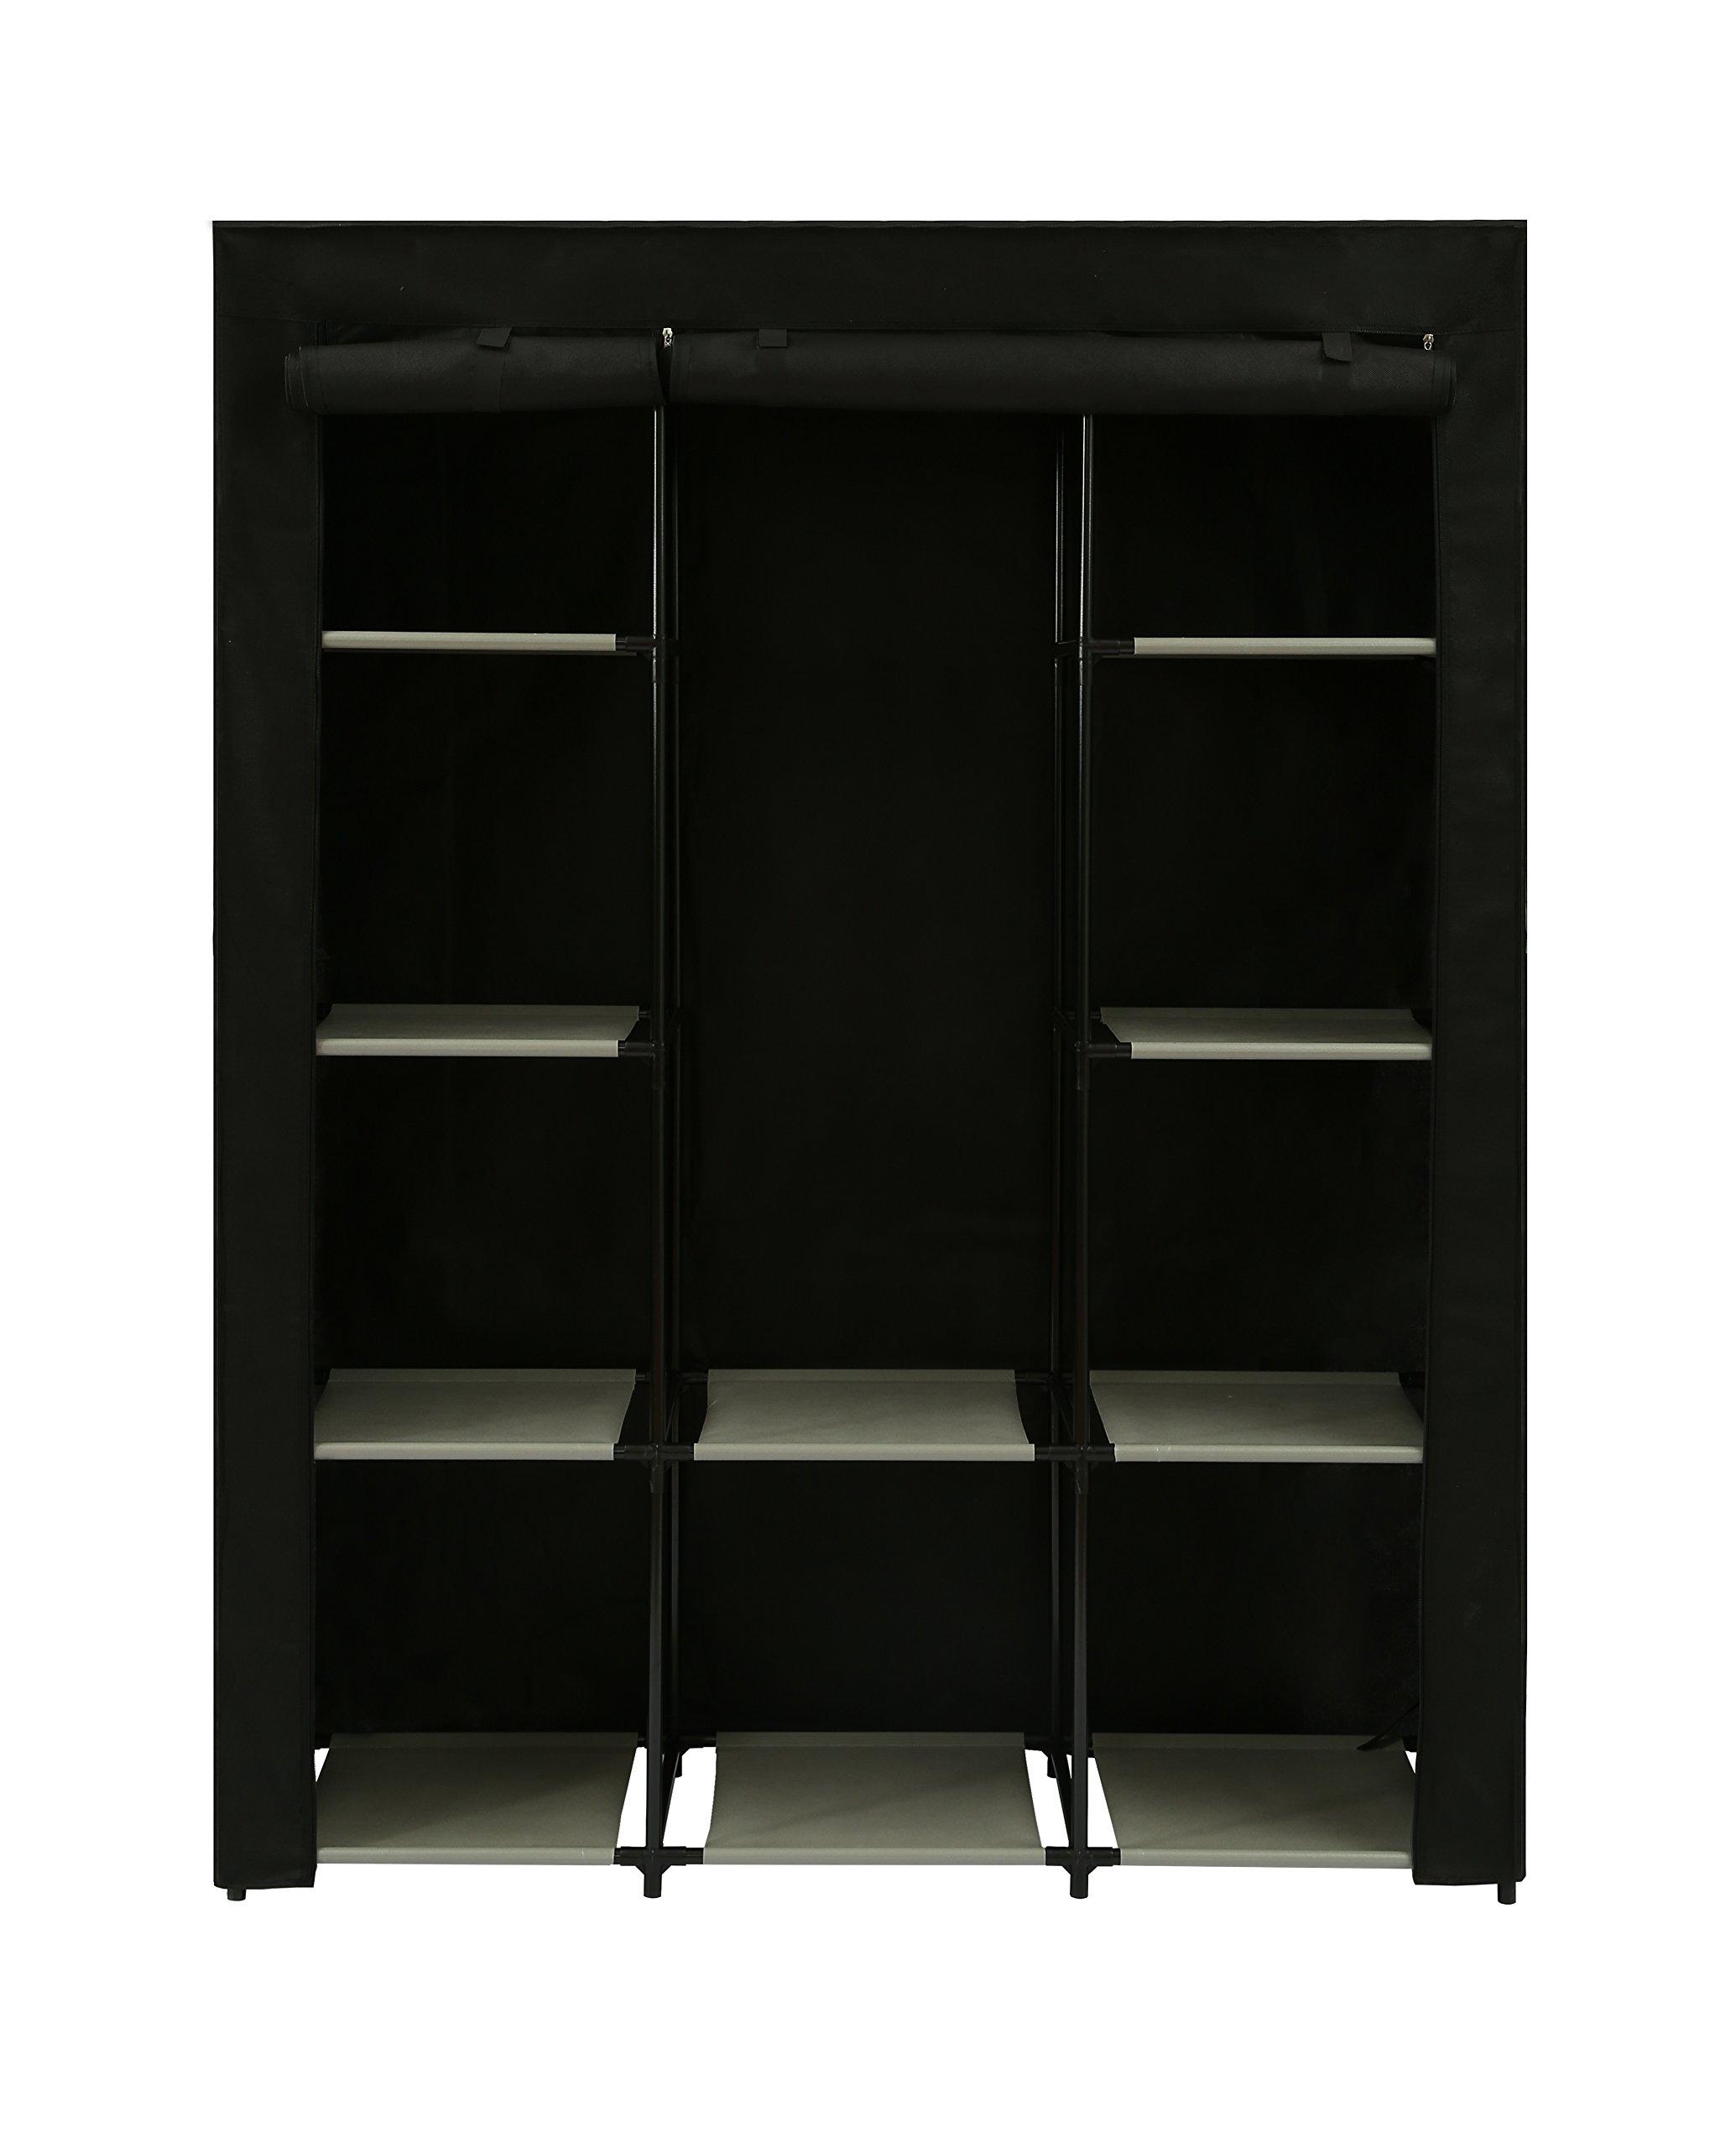 Home-Like Portable Wardrobe Bedroom Armoires Clothes Closet Non-Woven Fabric Wardrobe Storage Cabinet Clothes Storage Organizer 10 Closet Shelves Black Color 51.18''L x 17.71''W x 63.35''H (115B-Black)